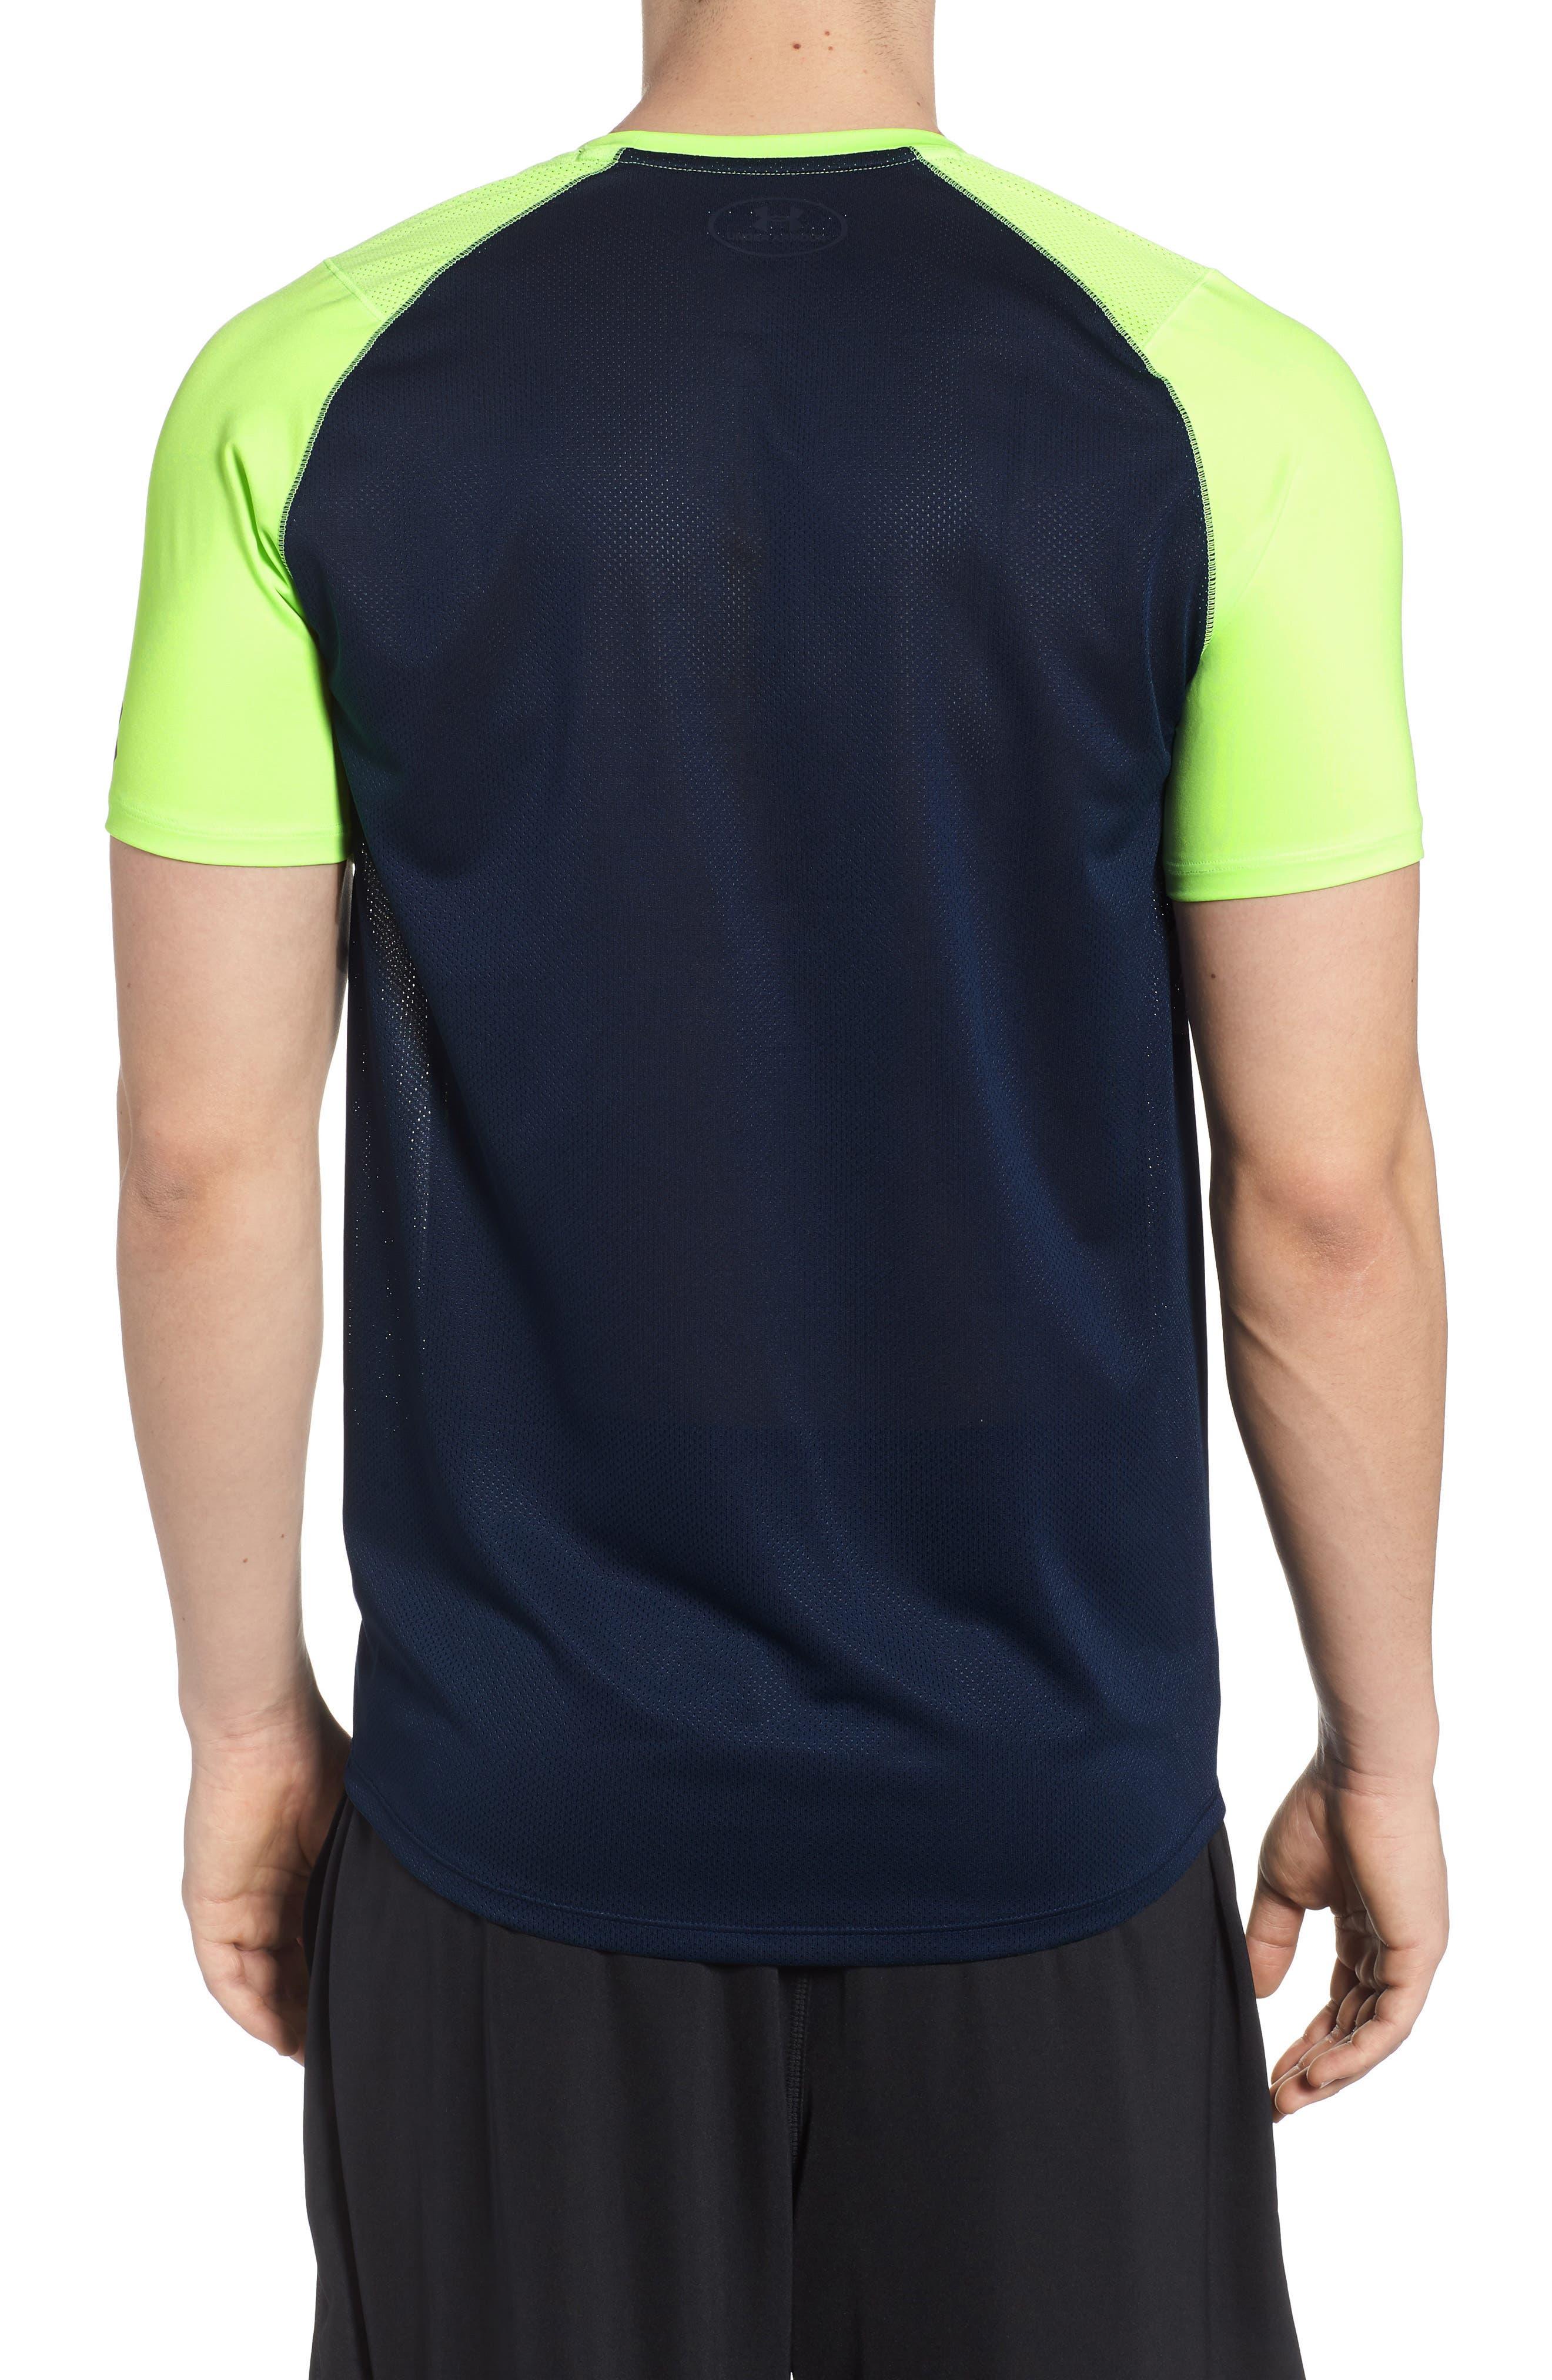 MK1 Dash Crewneck T-Shirt,                             Alternate thumbnail 2, color,                             312